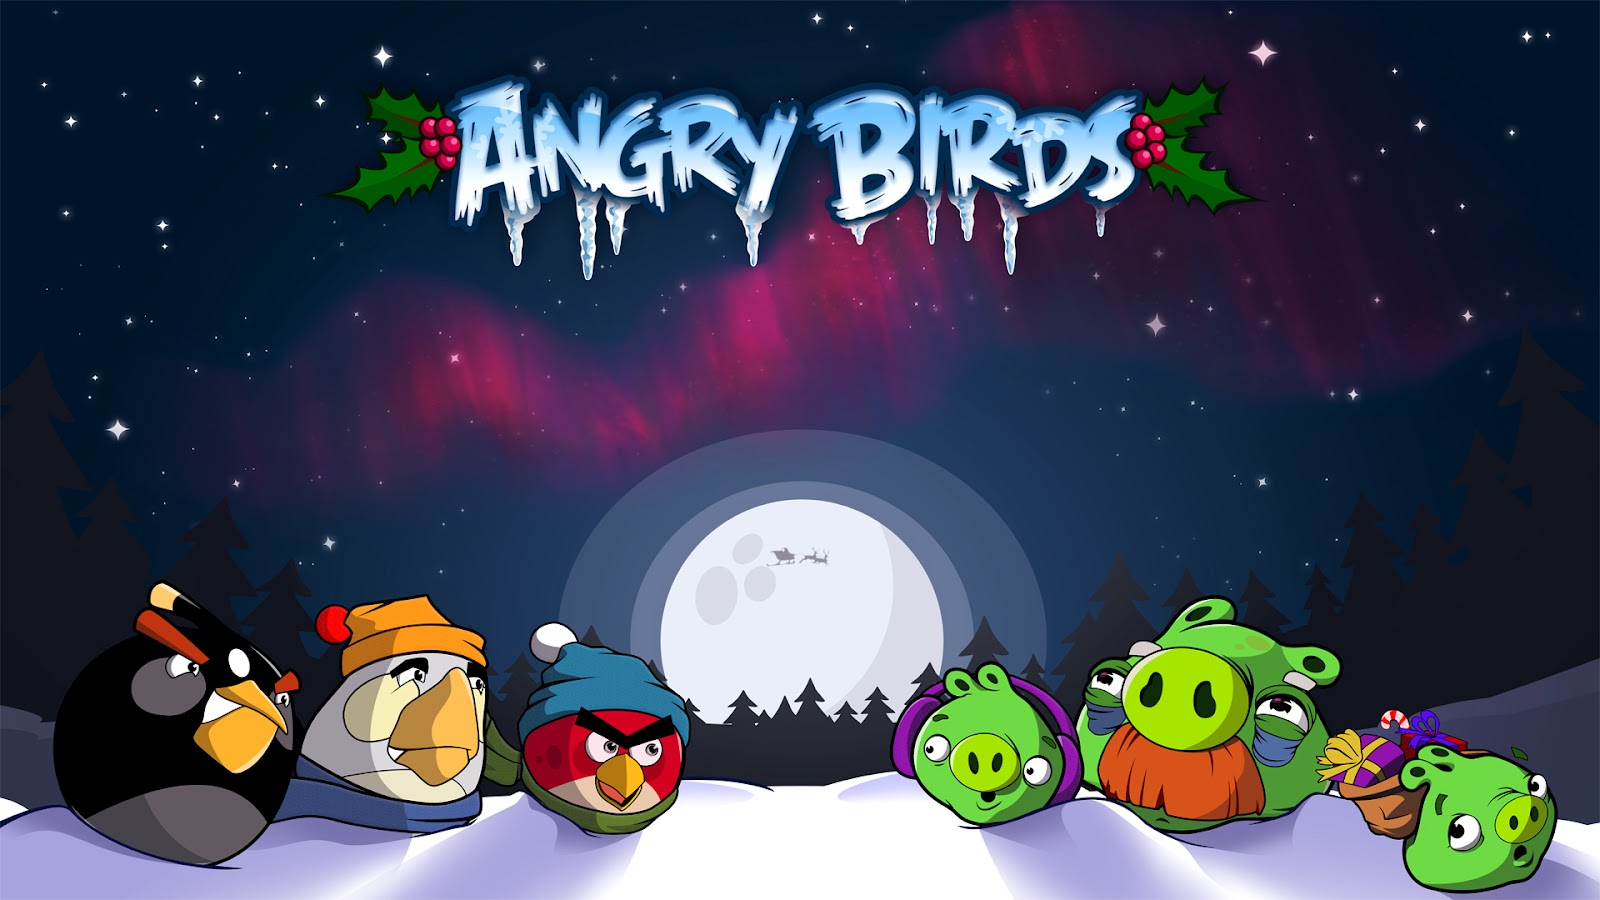 http://1.bp.blogspot.com/-bJifCUWbR9M/UBFrEBGqhlI/AAAAAAAAD6w/28e1veyzWxU/s1600/angry-birds-wallpapers+%289%29.jpg